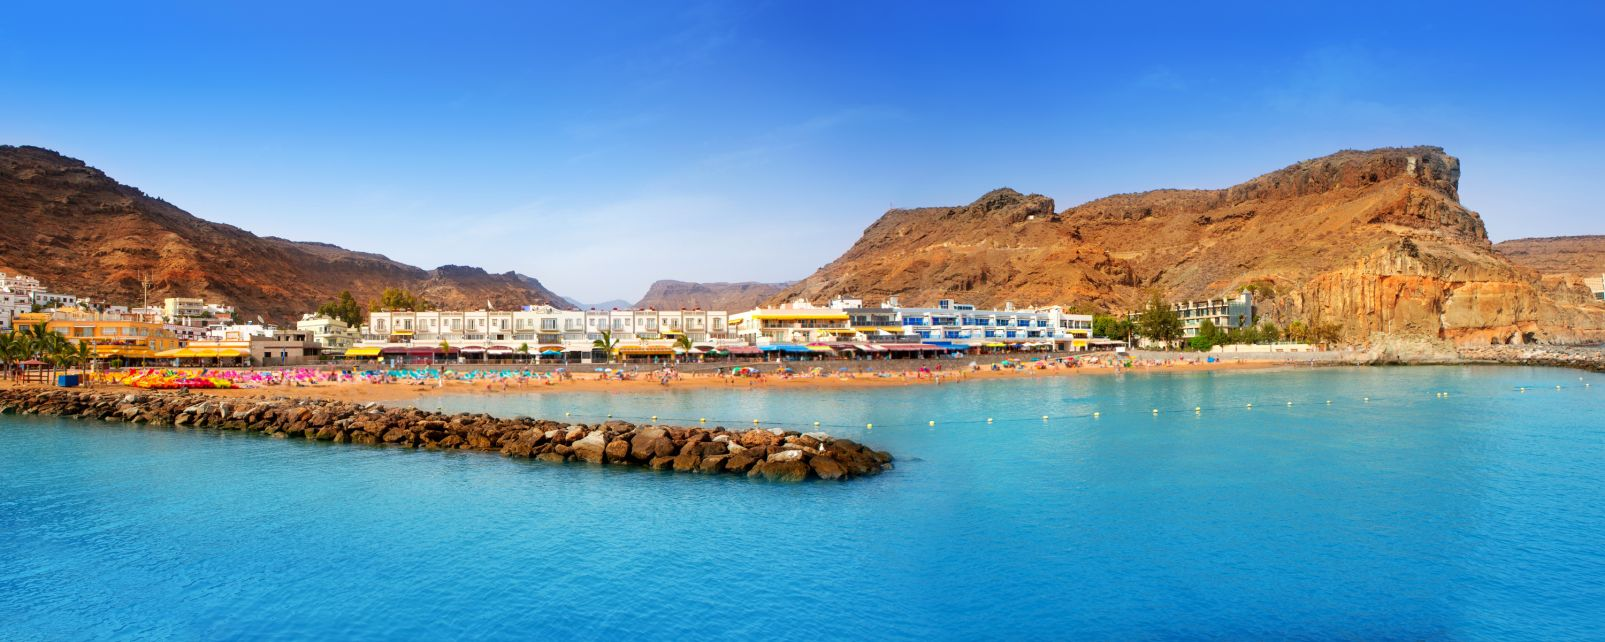 Mogan Canary Islands Spain